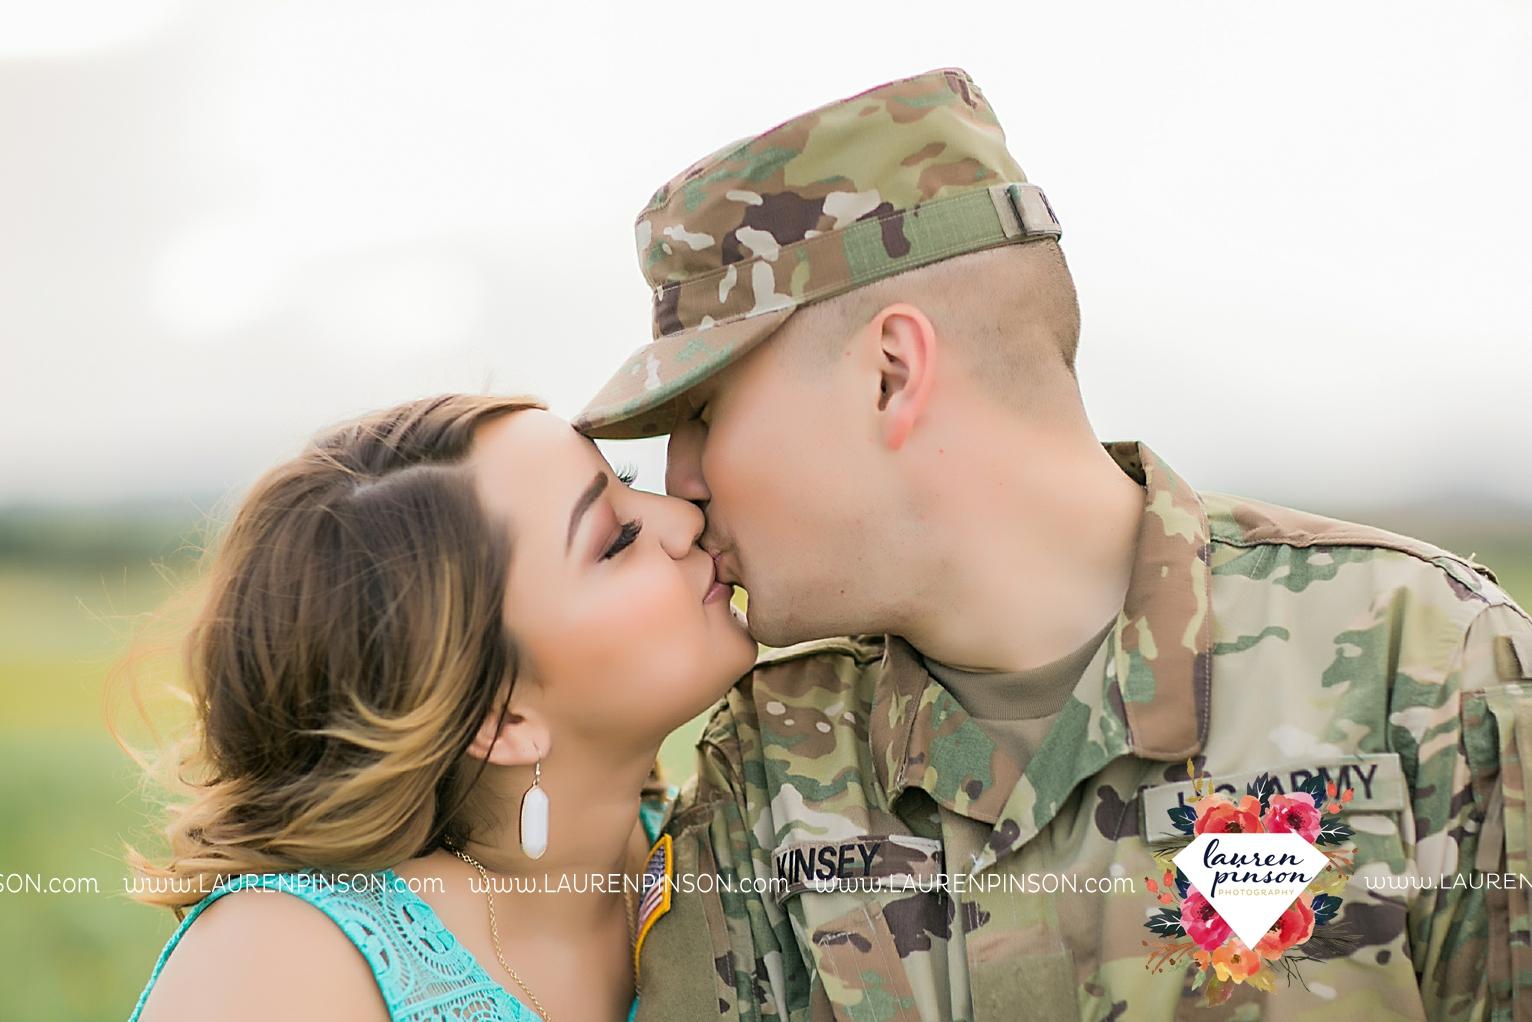 wichita-falls-texas-wedding-photography-engagement-session-army-fort-sill-lawton-oklahoma-wichita-mountains-newlyweds-00009.jpg